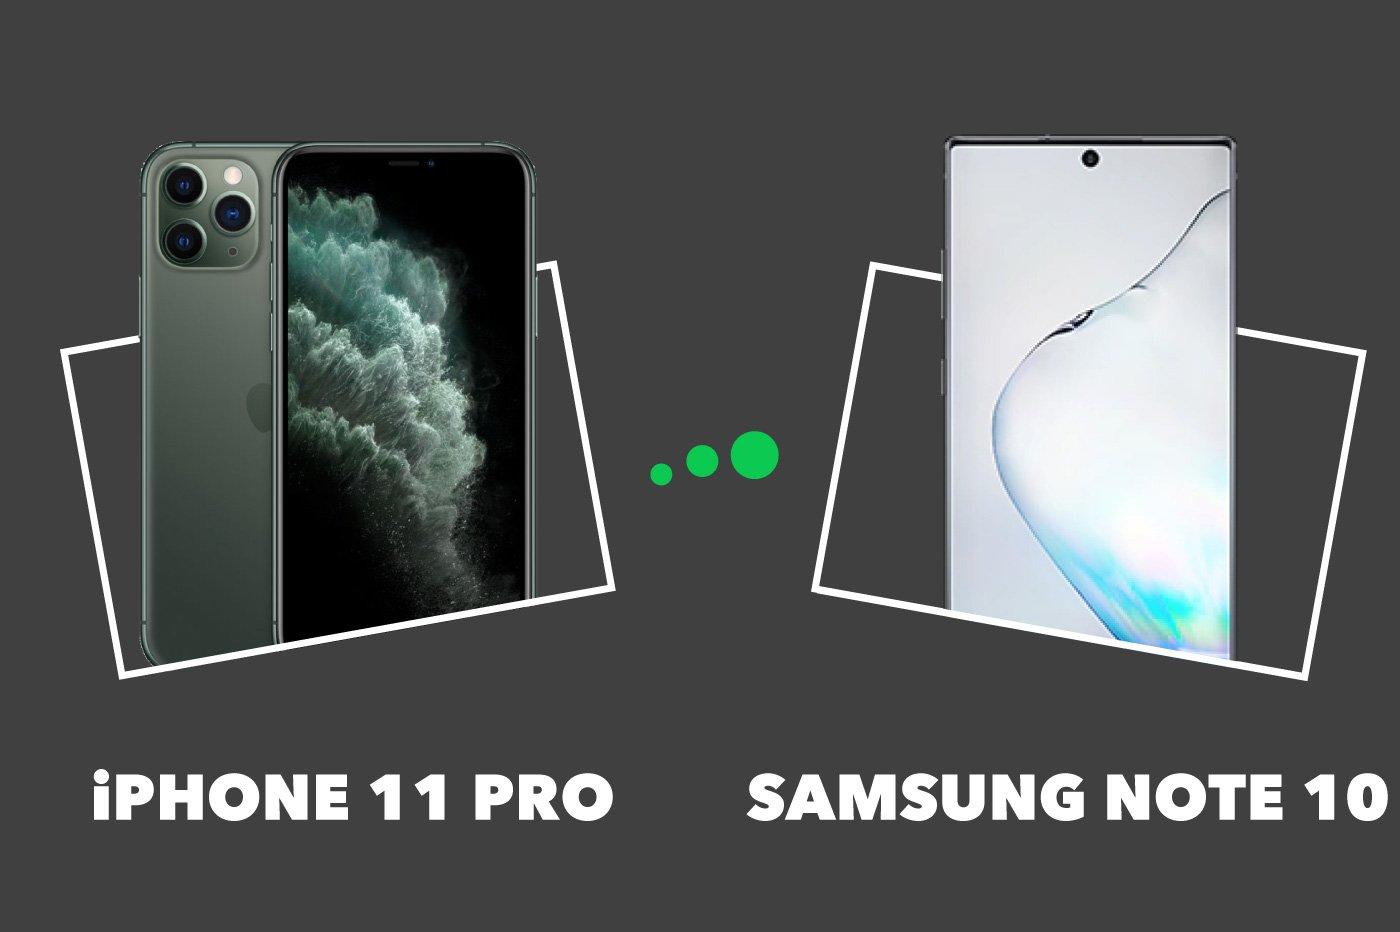 iPhone 11 Pro vs Samsung Galaxy Note 10 : comparatif et différences